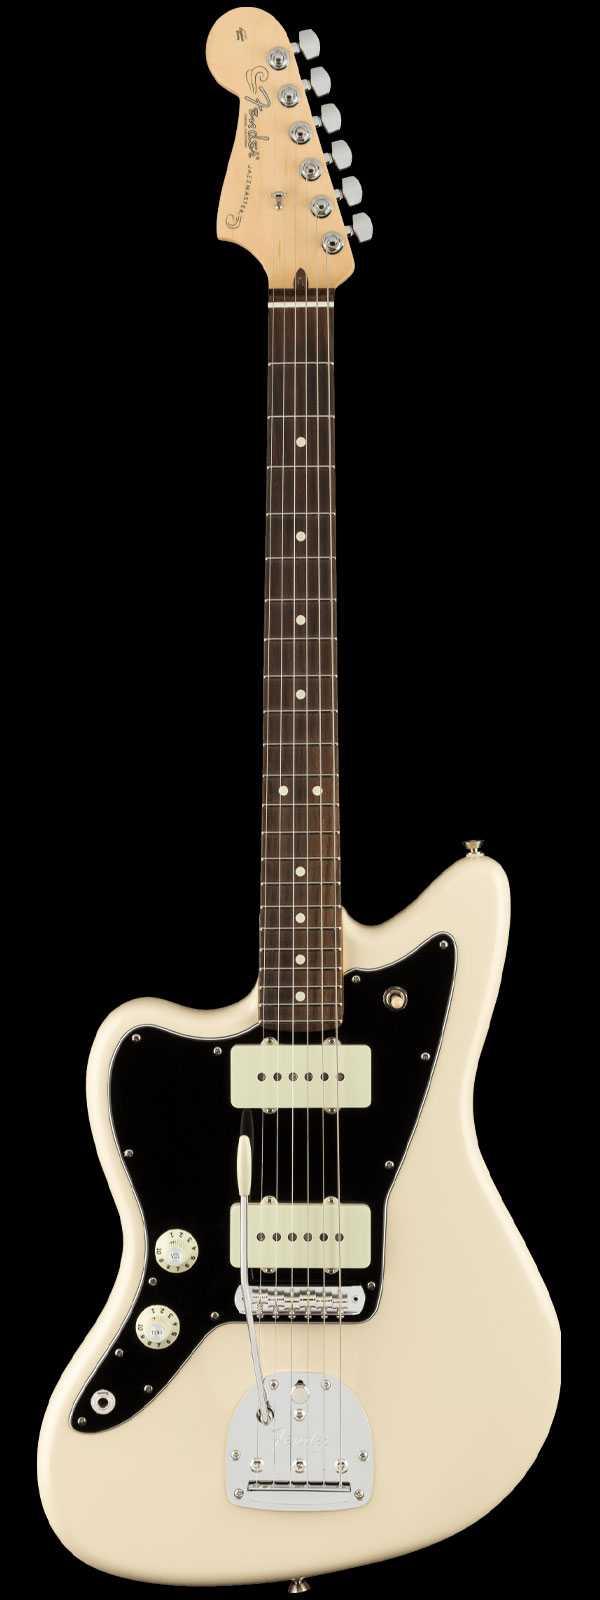 Fender American Pro Left-Handed Jazzmaster Rosewood Fingerboard Olympic White